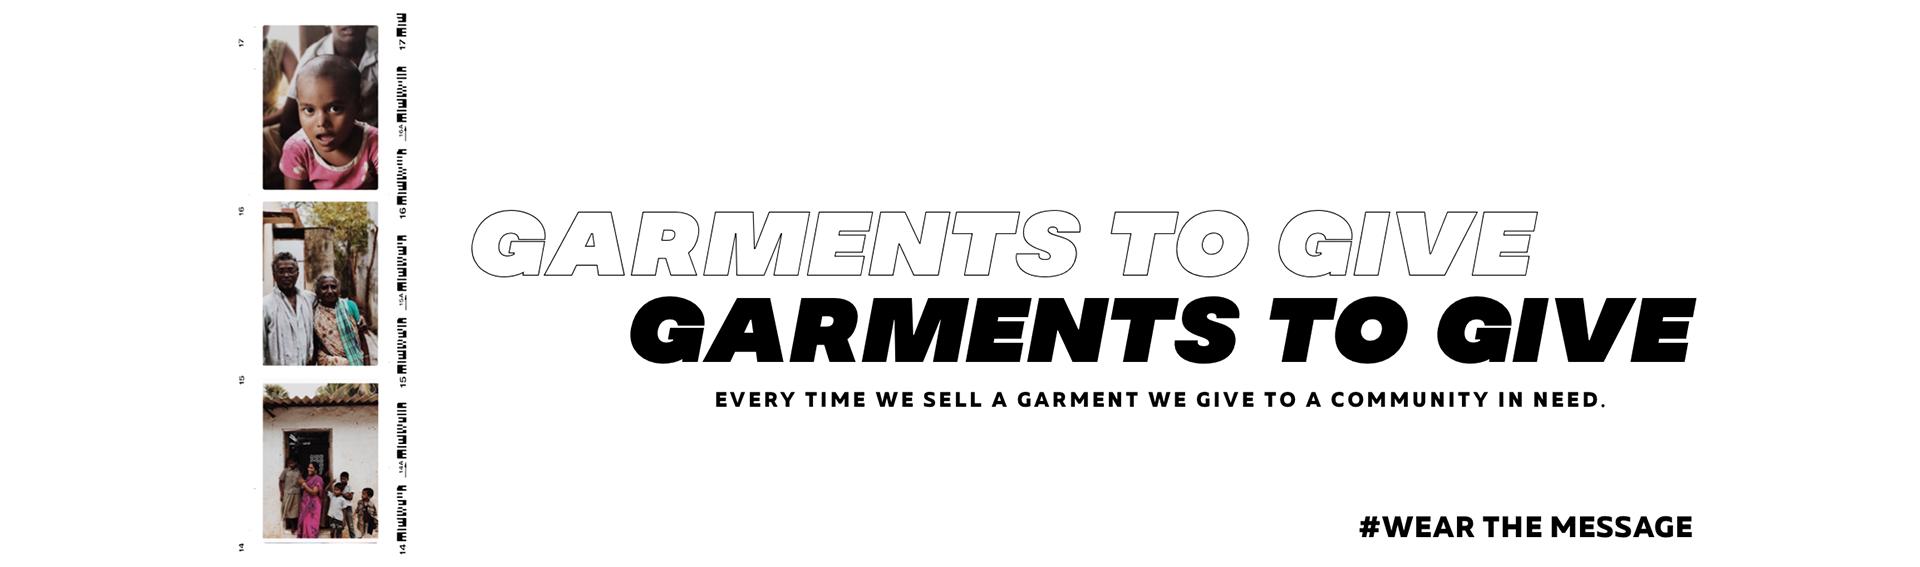 GarmentsToGive.png